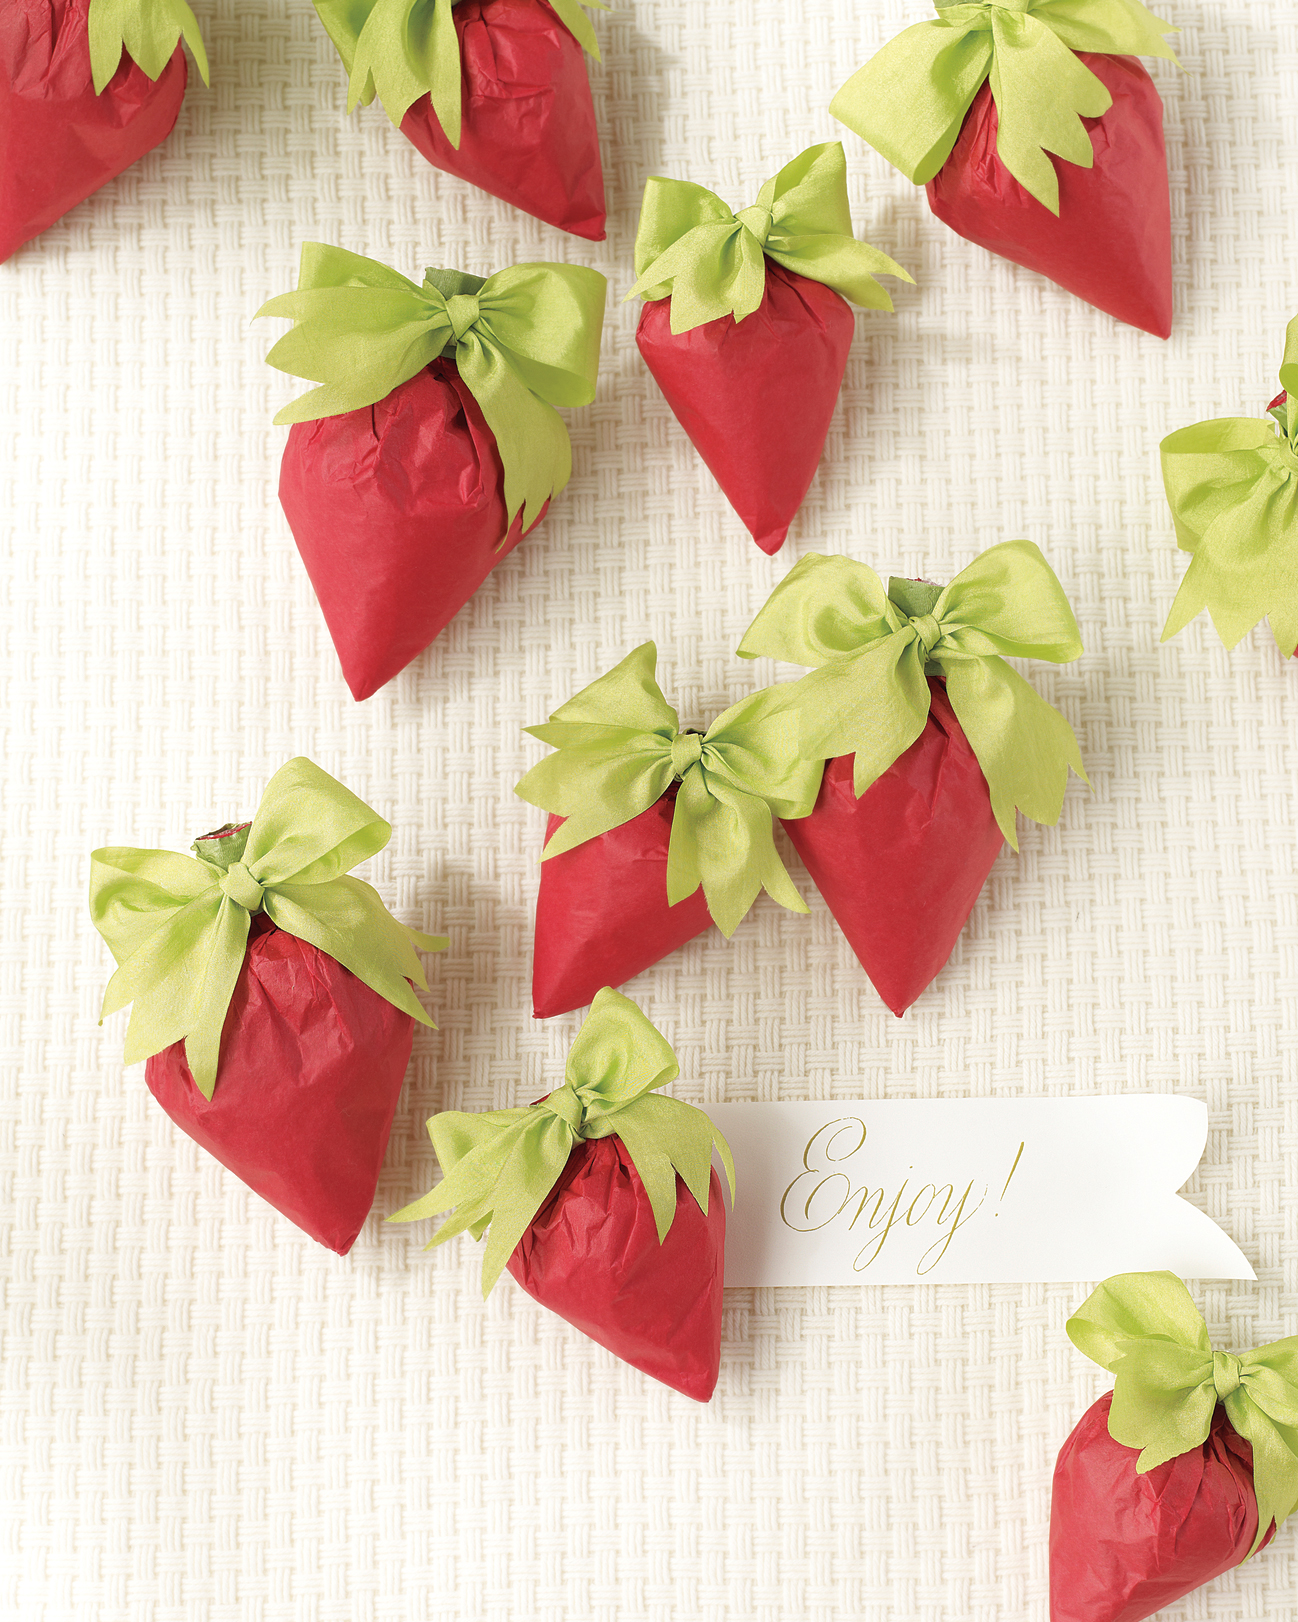 berry-bonbons-mwd107768.jpg